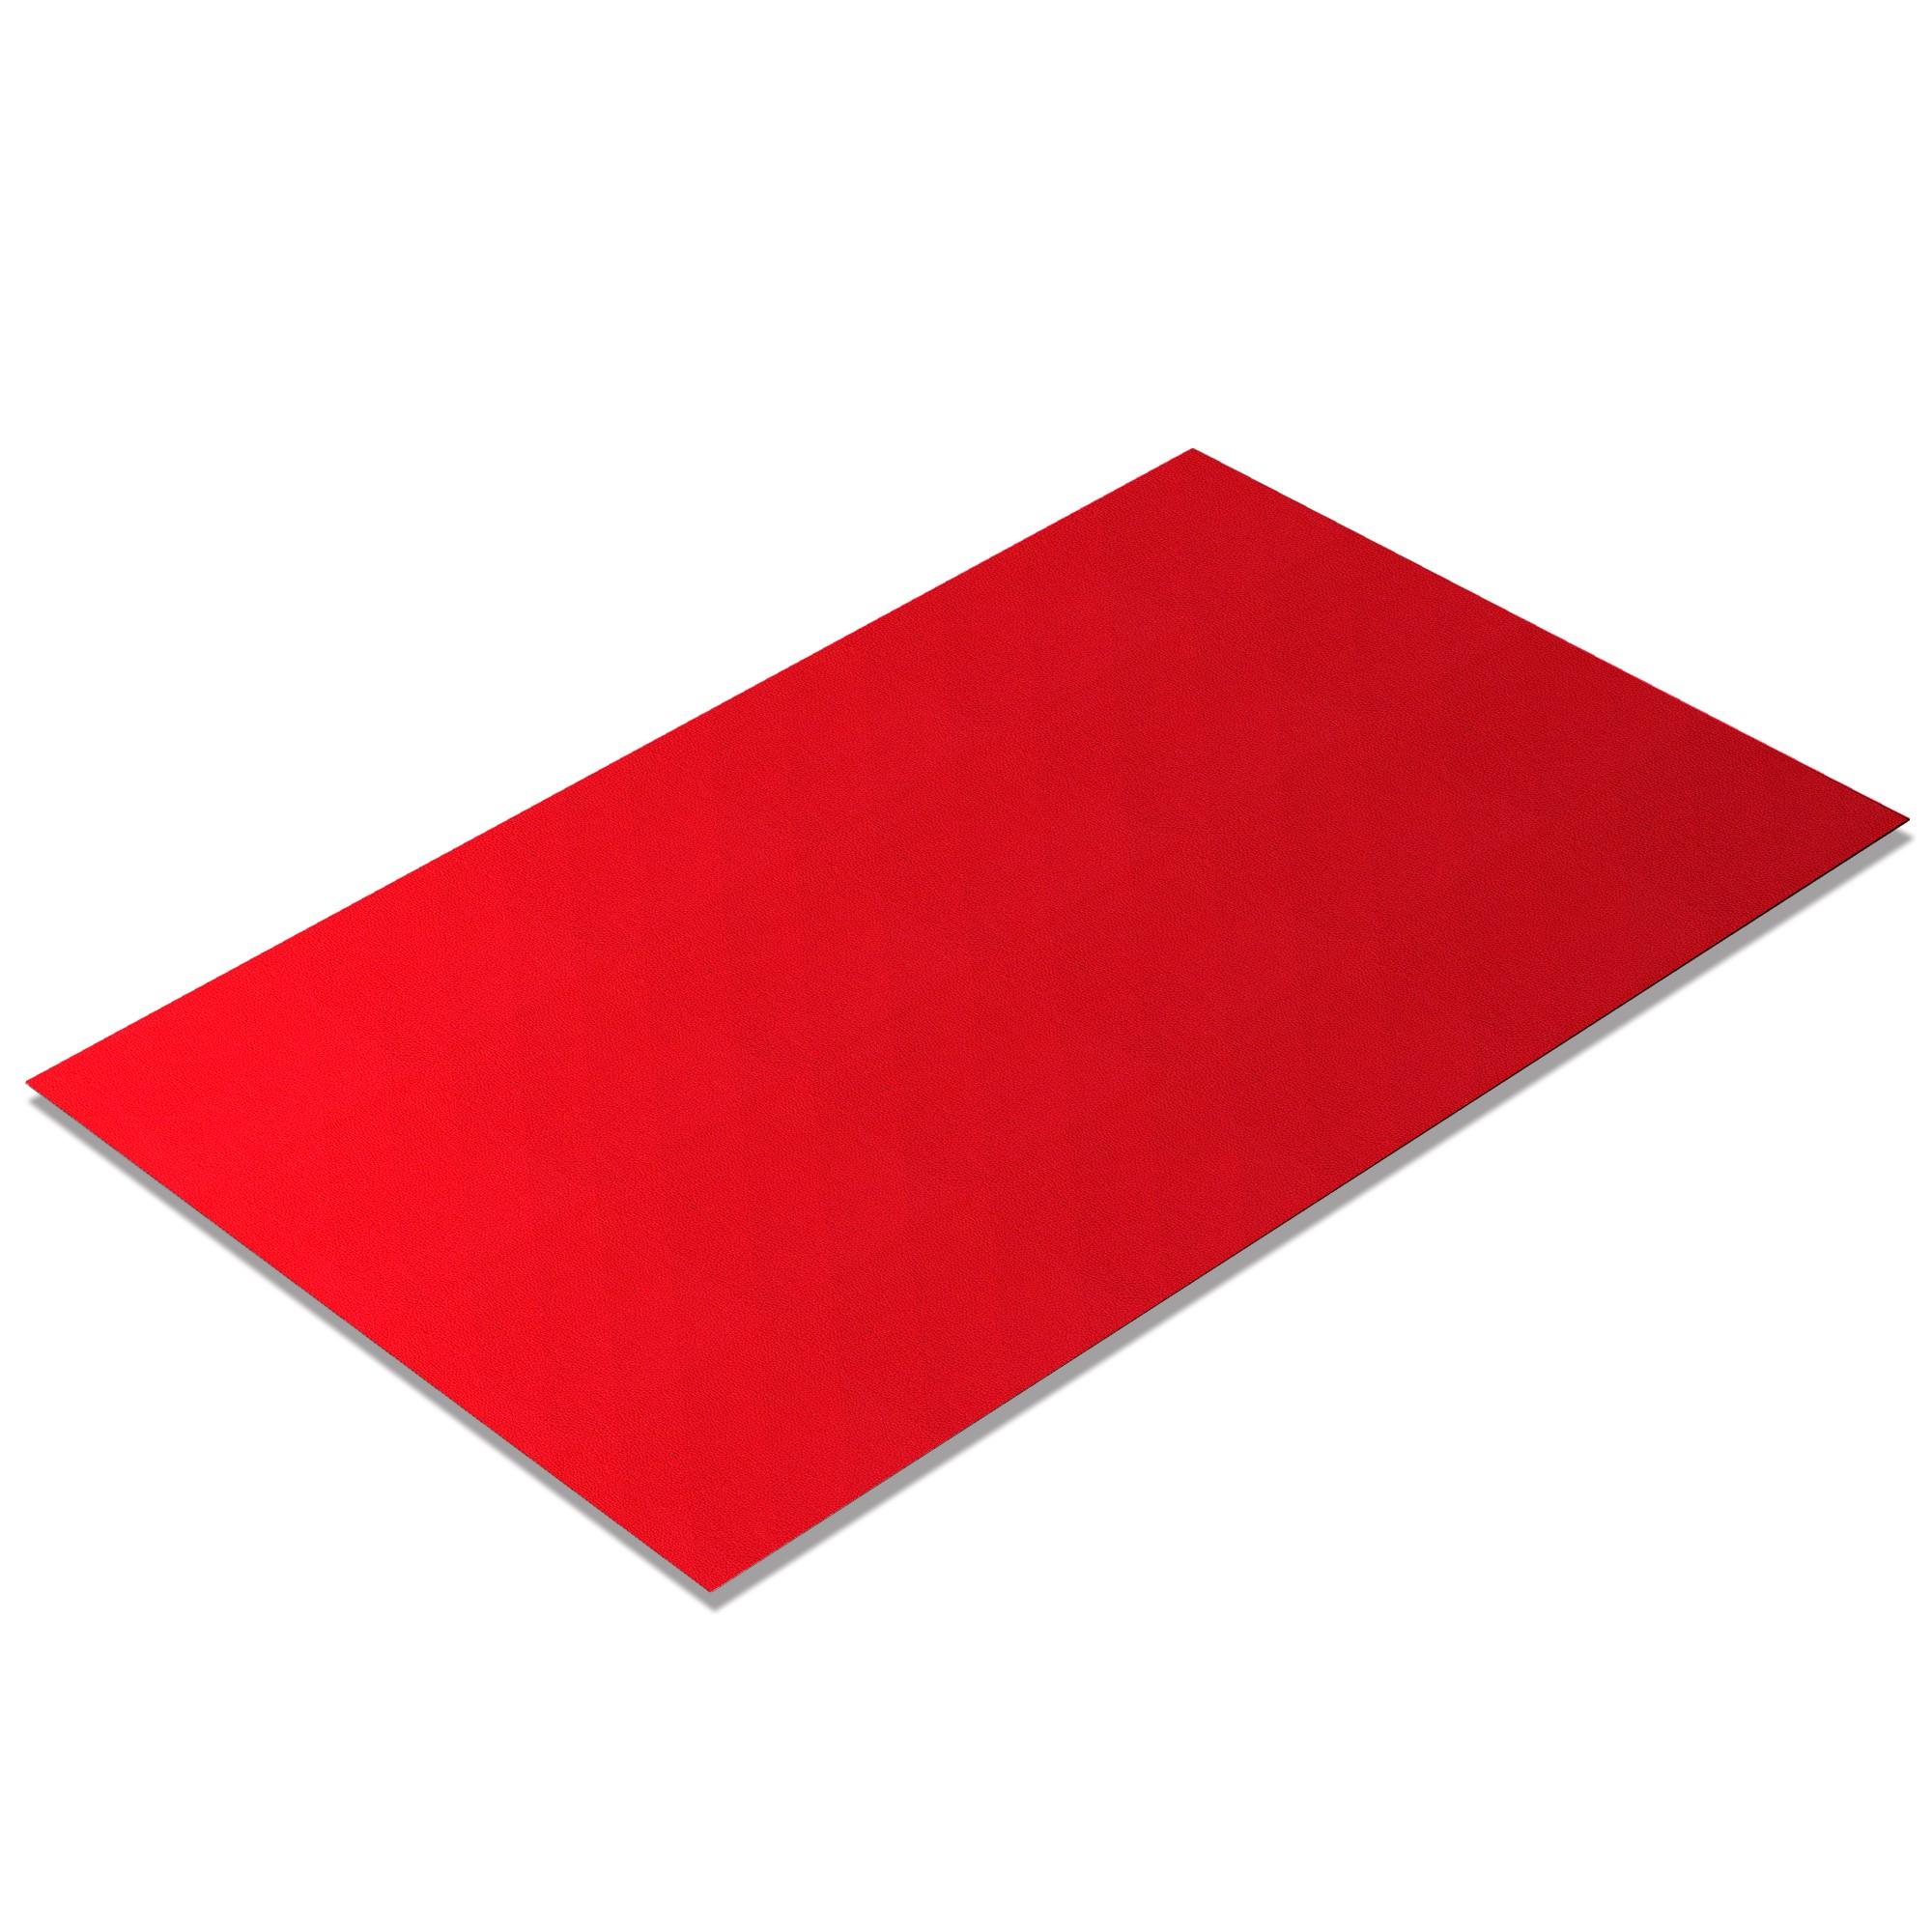 Kunstleder Meterware Latigo Red [LAT300]